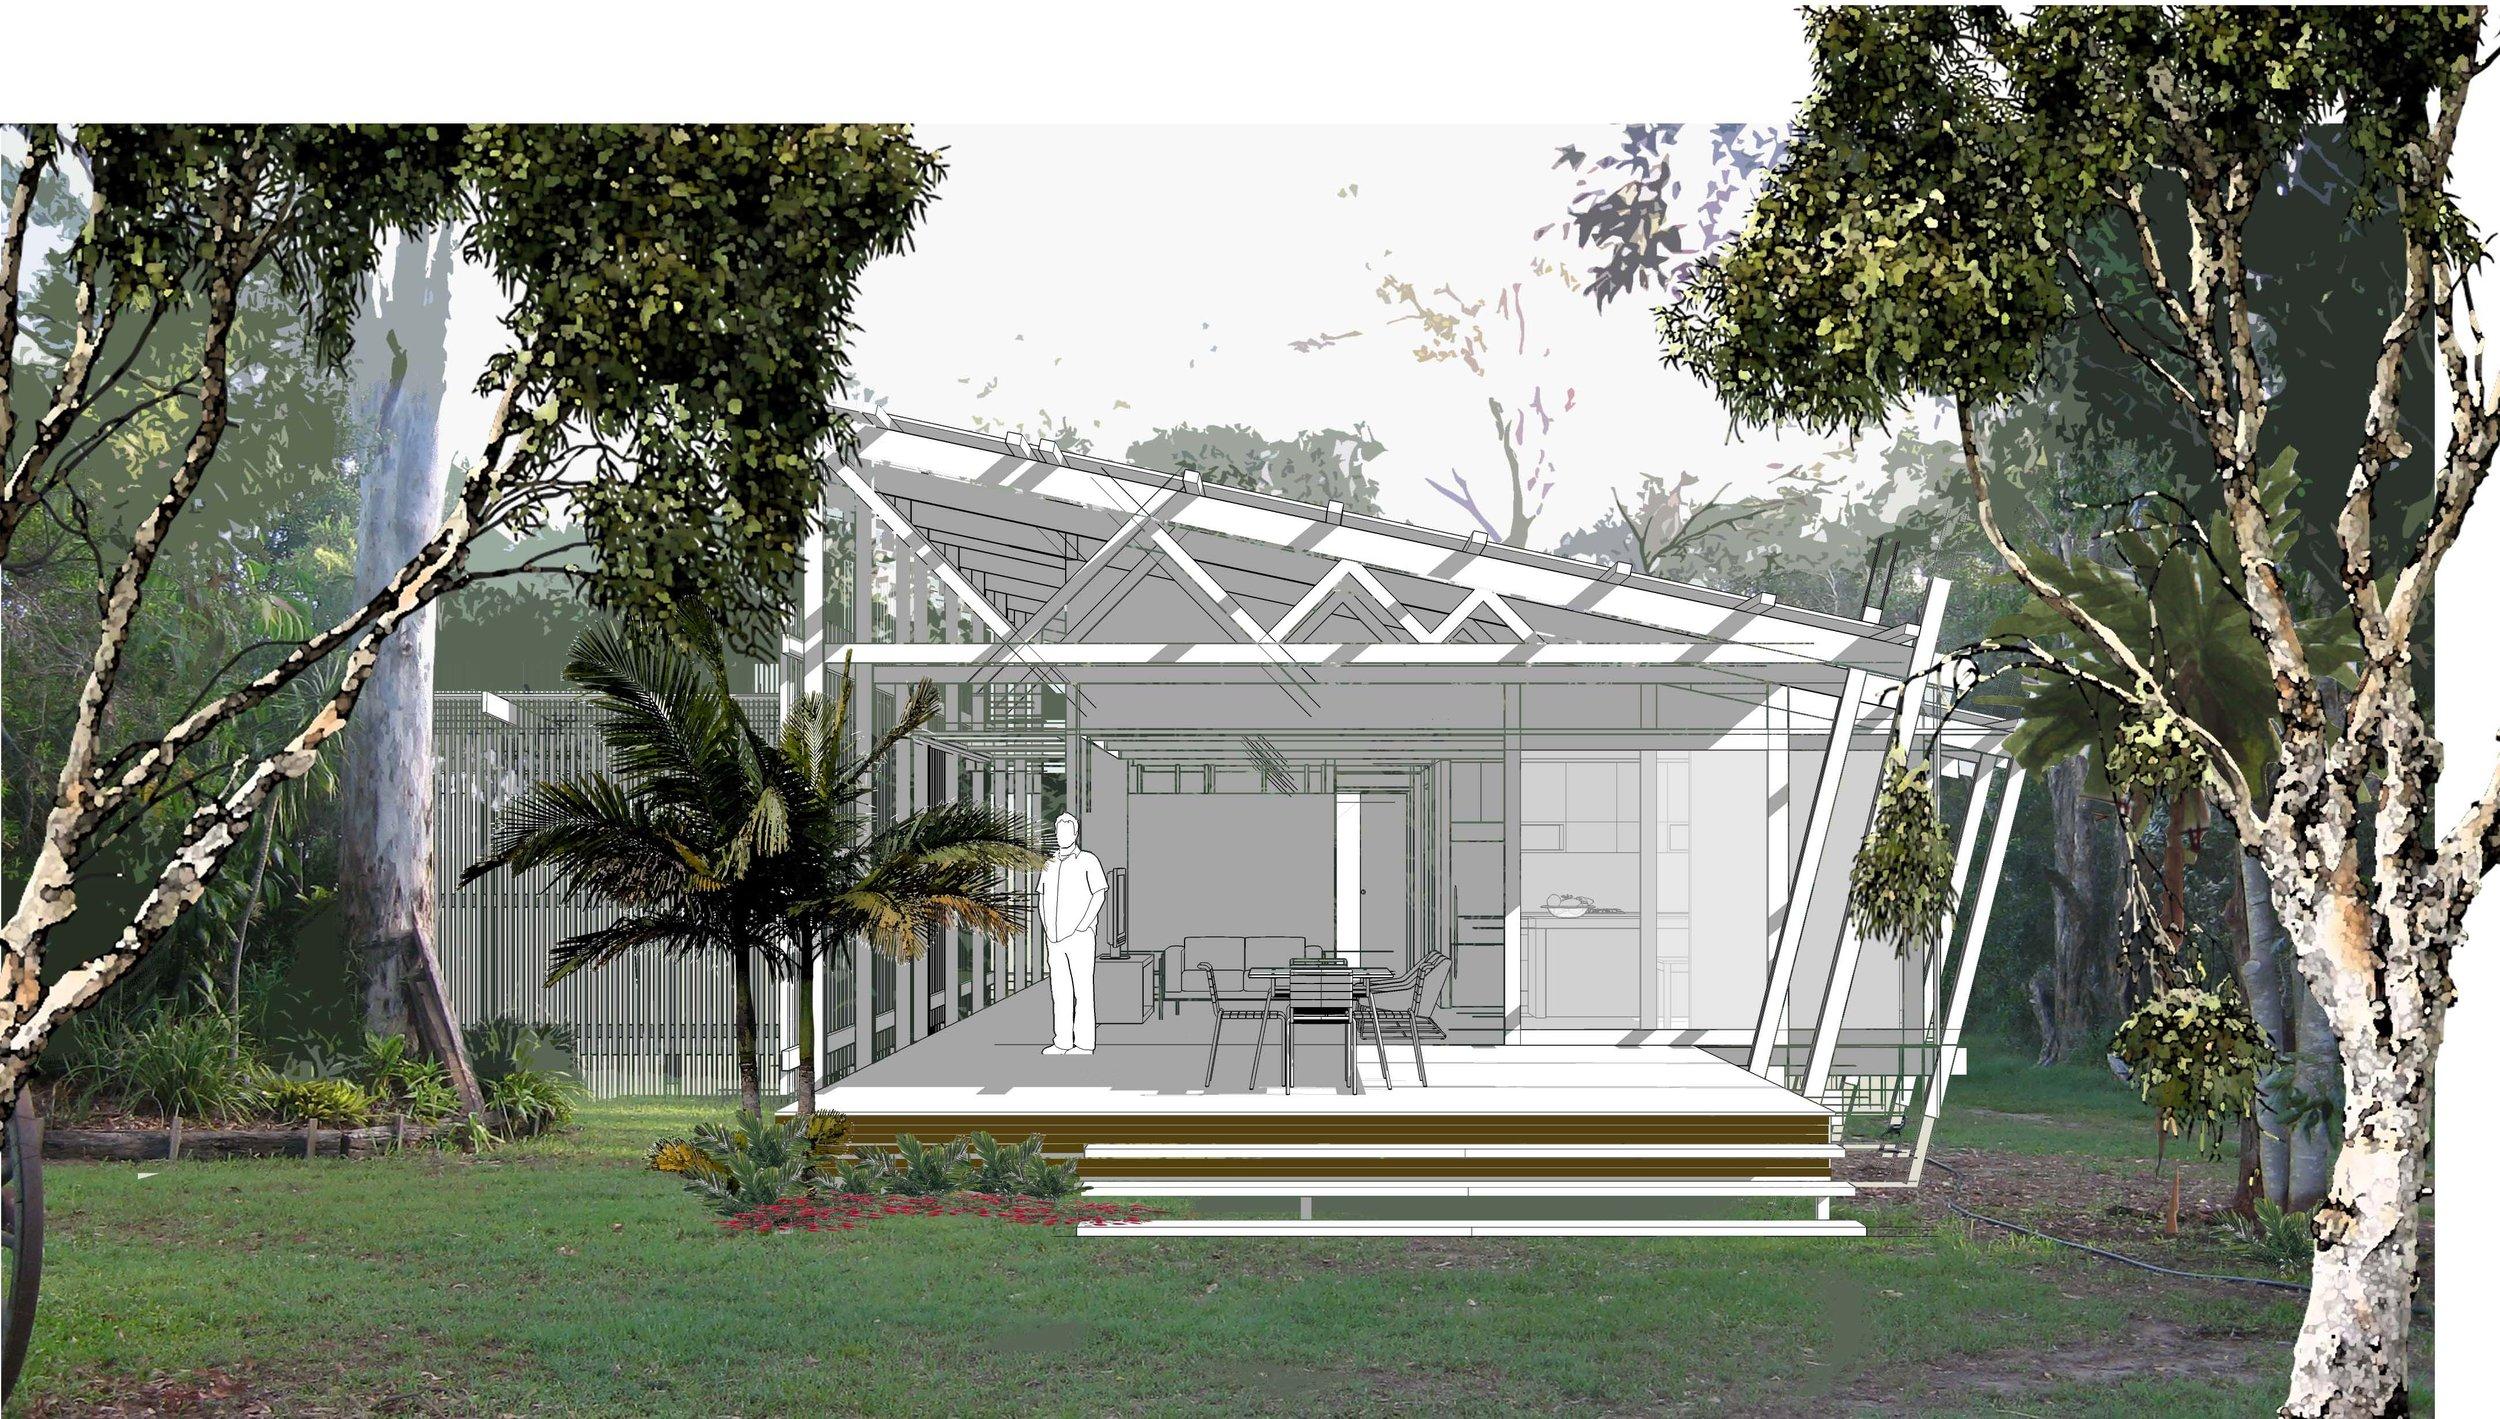 LOTA SMALL HOUSE